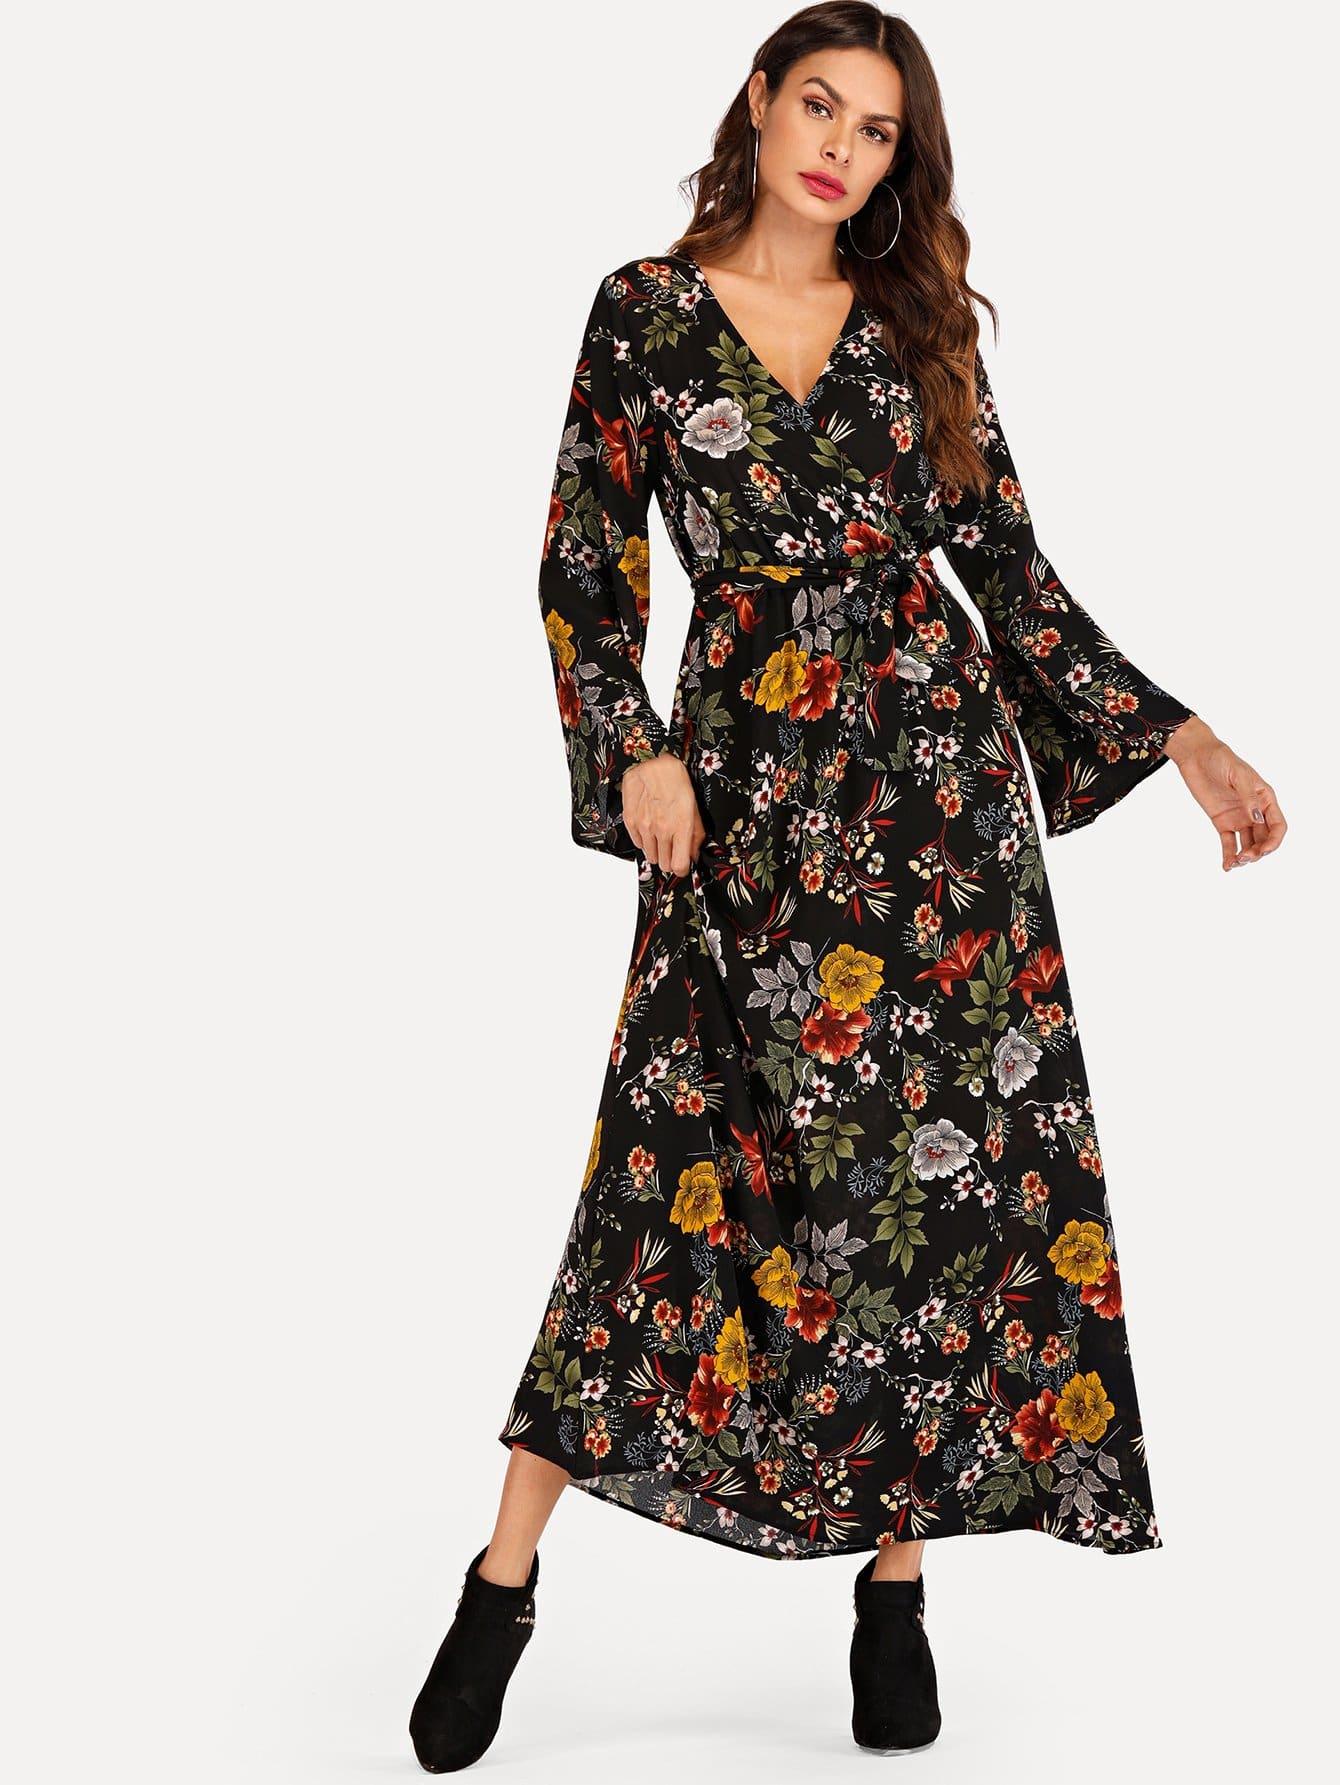 Floral Print Self Tie Waist Wrap Dress